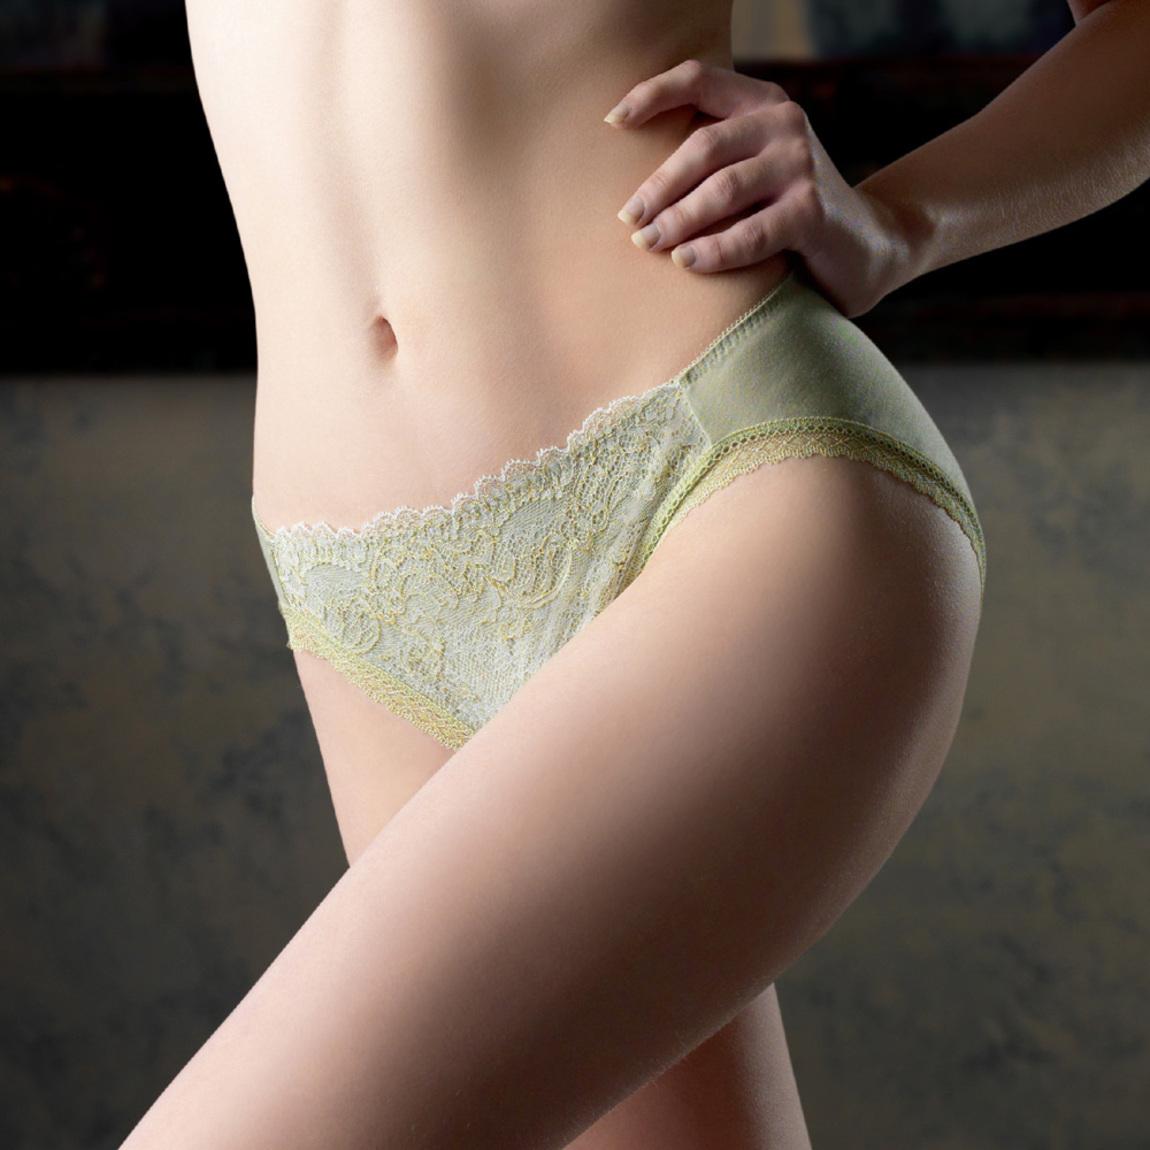 【Lofan 露蒂芬】  常春藤 法式蕾絲性感內褲 無痕褲 三角褲 中腰-綠(CS1723-GRN)